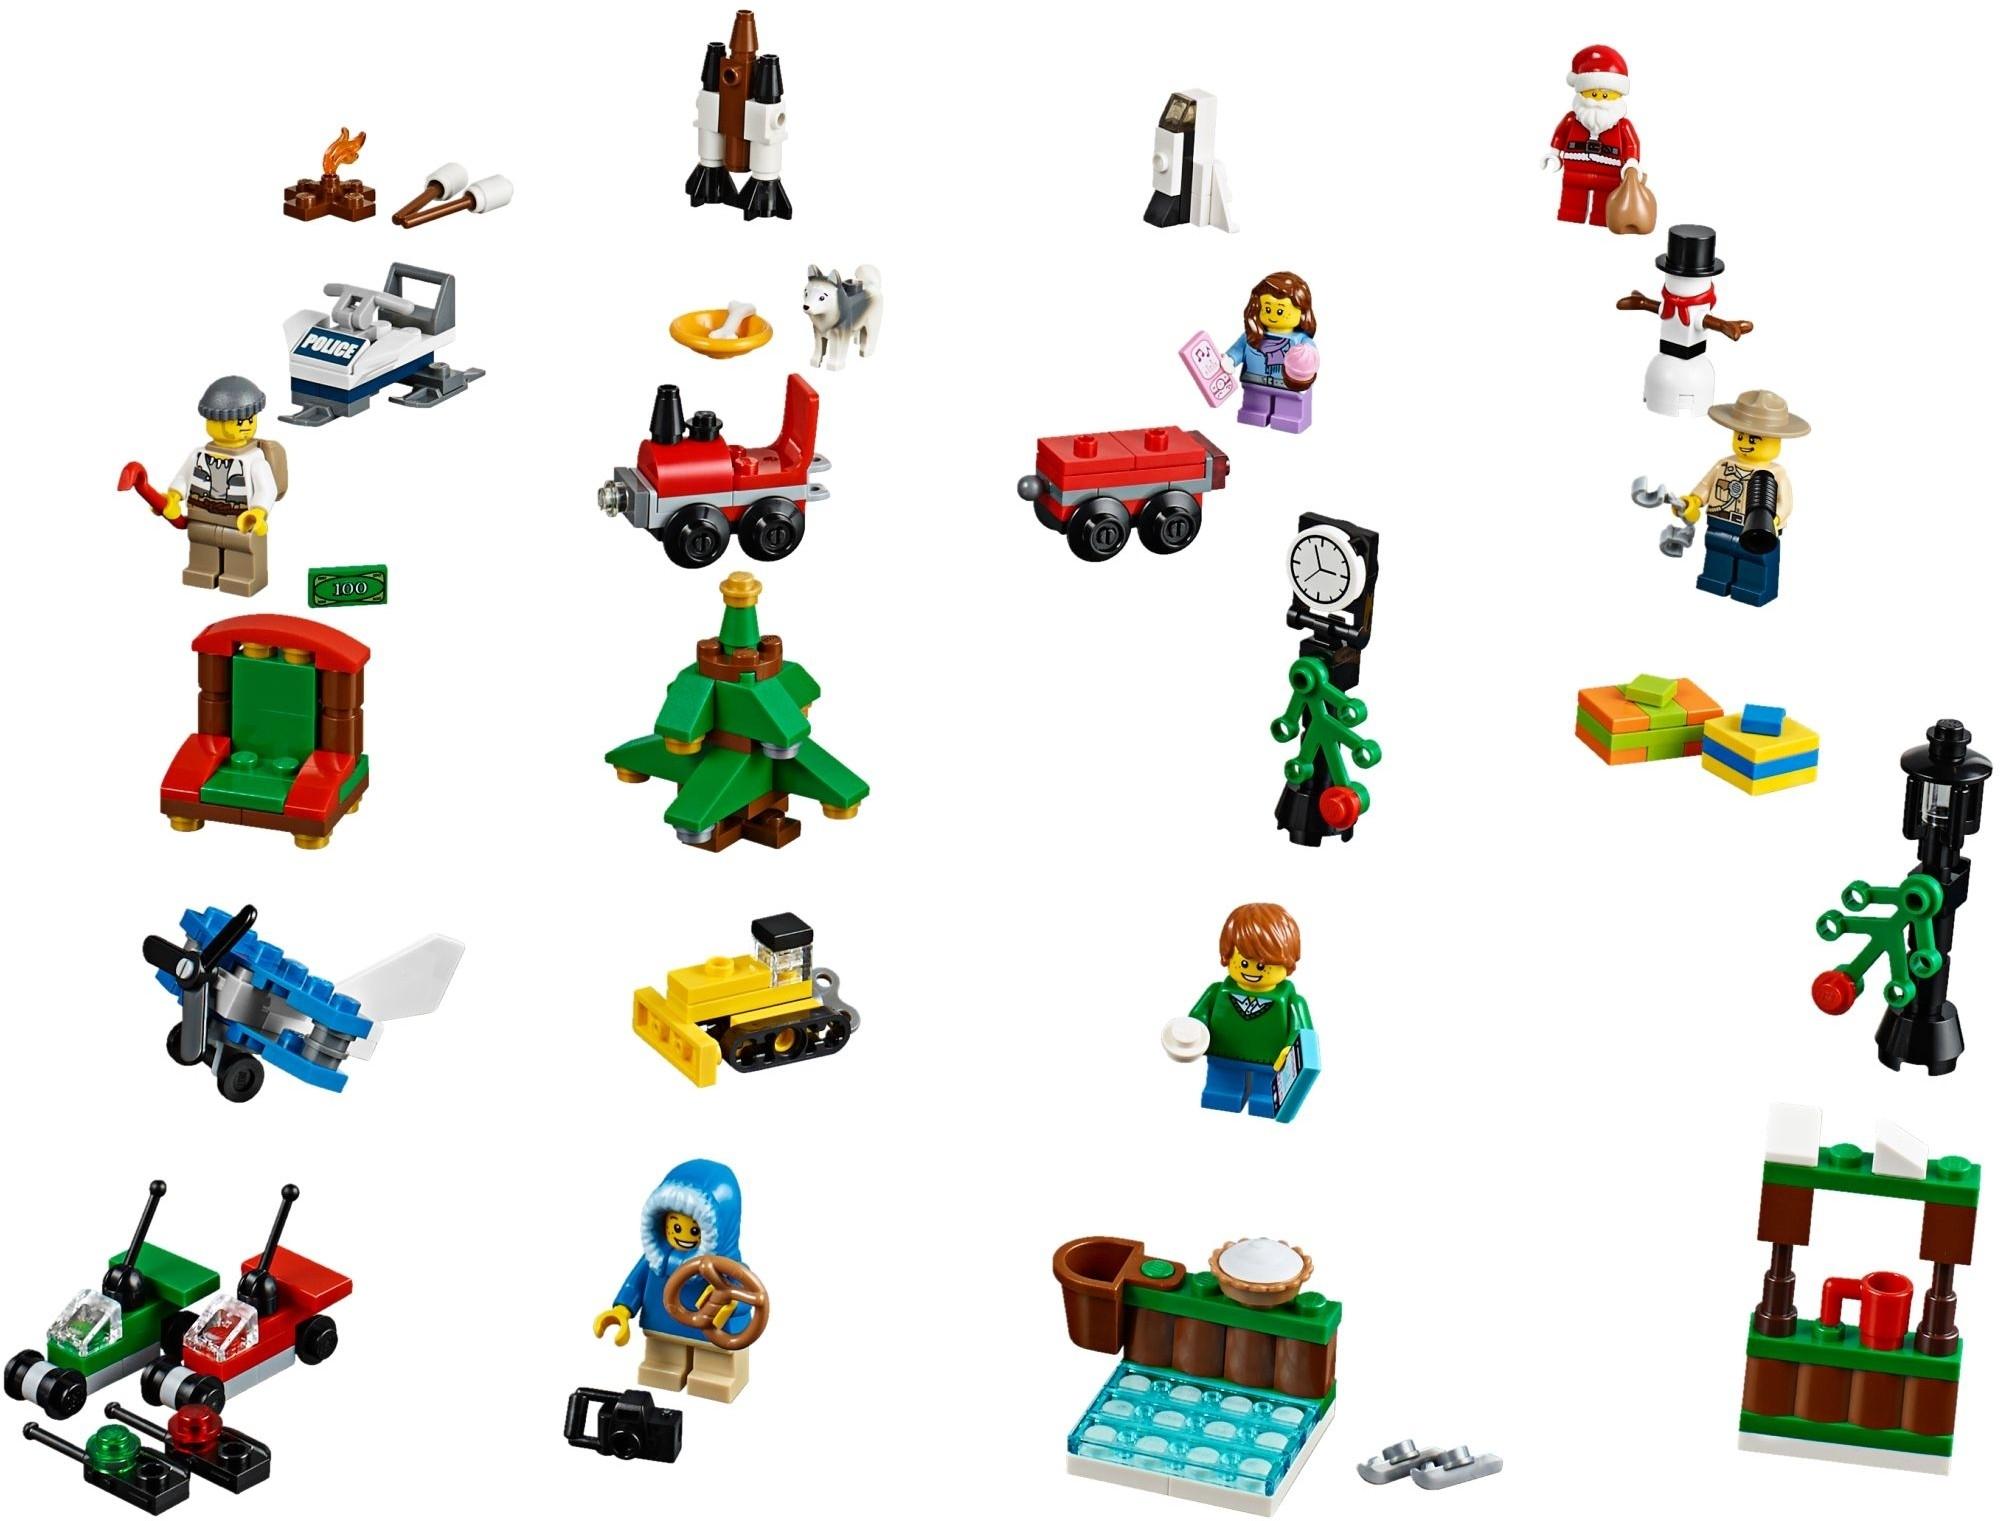 Lego City Advent Calendar Instructions 60099, City pertaining to Lego Star Wars Instructions Advent Calendar